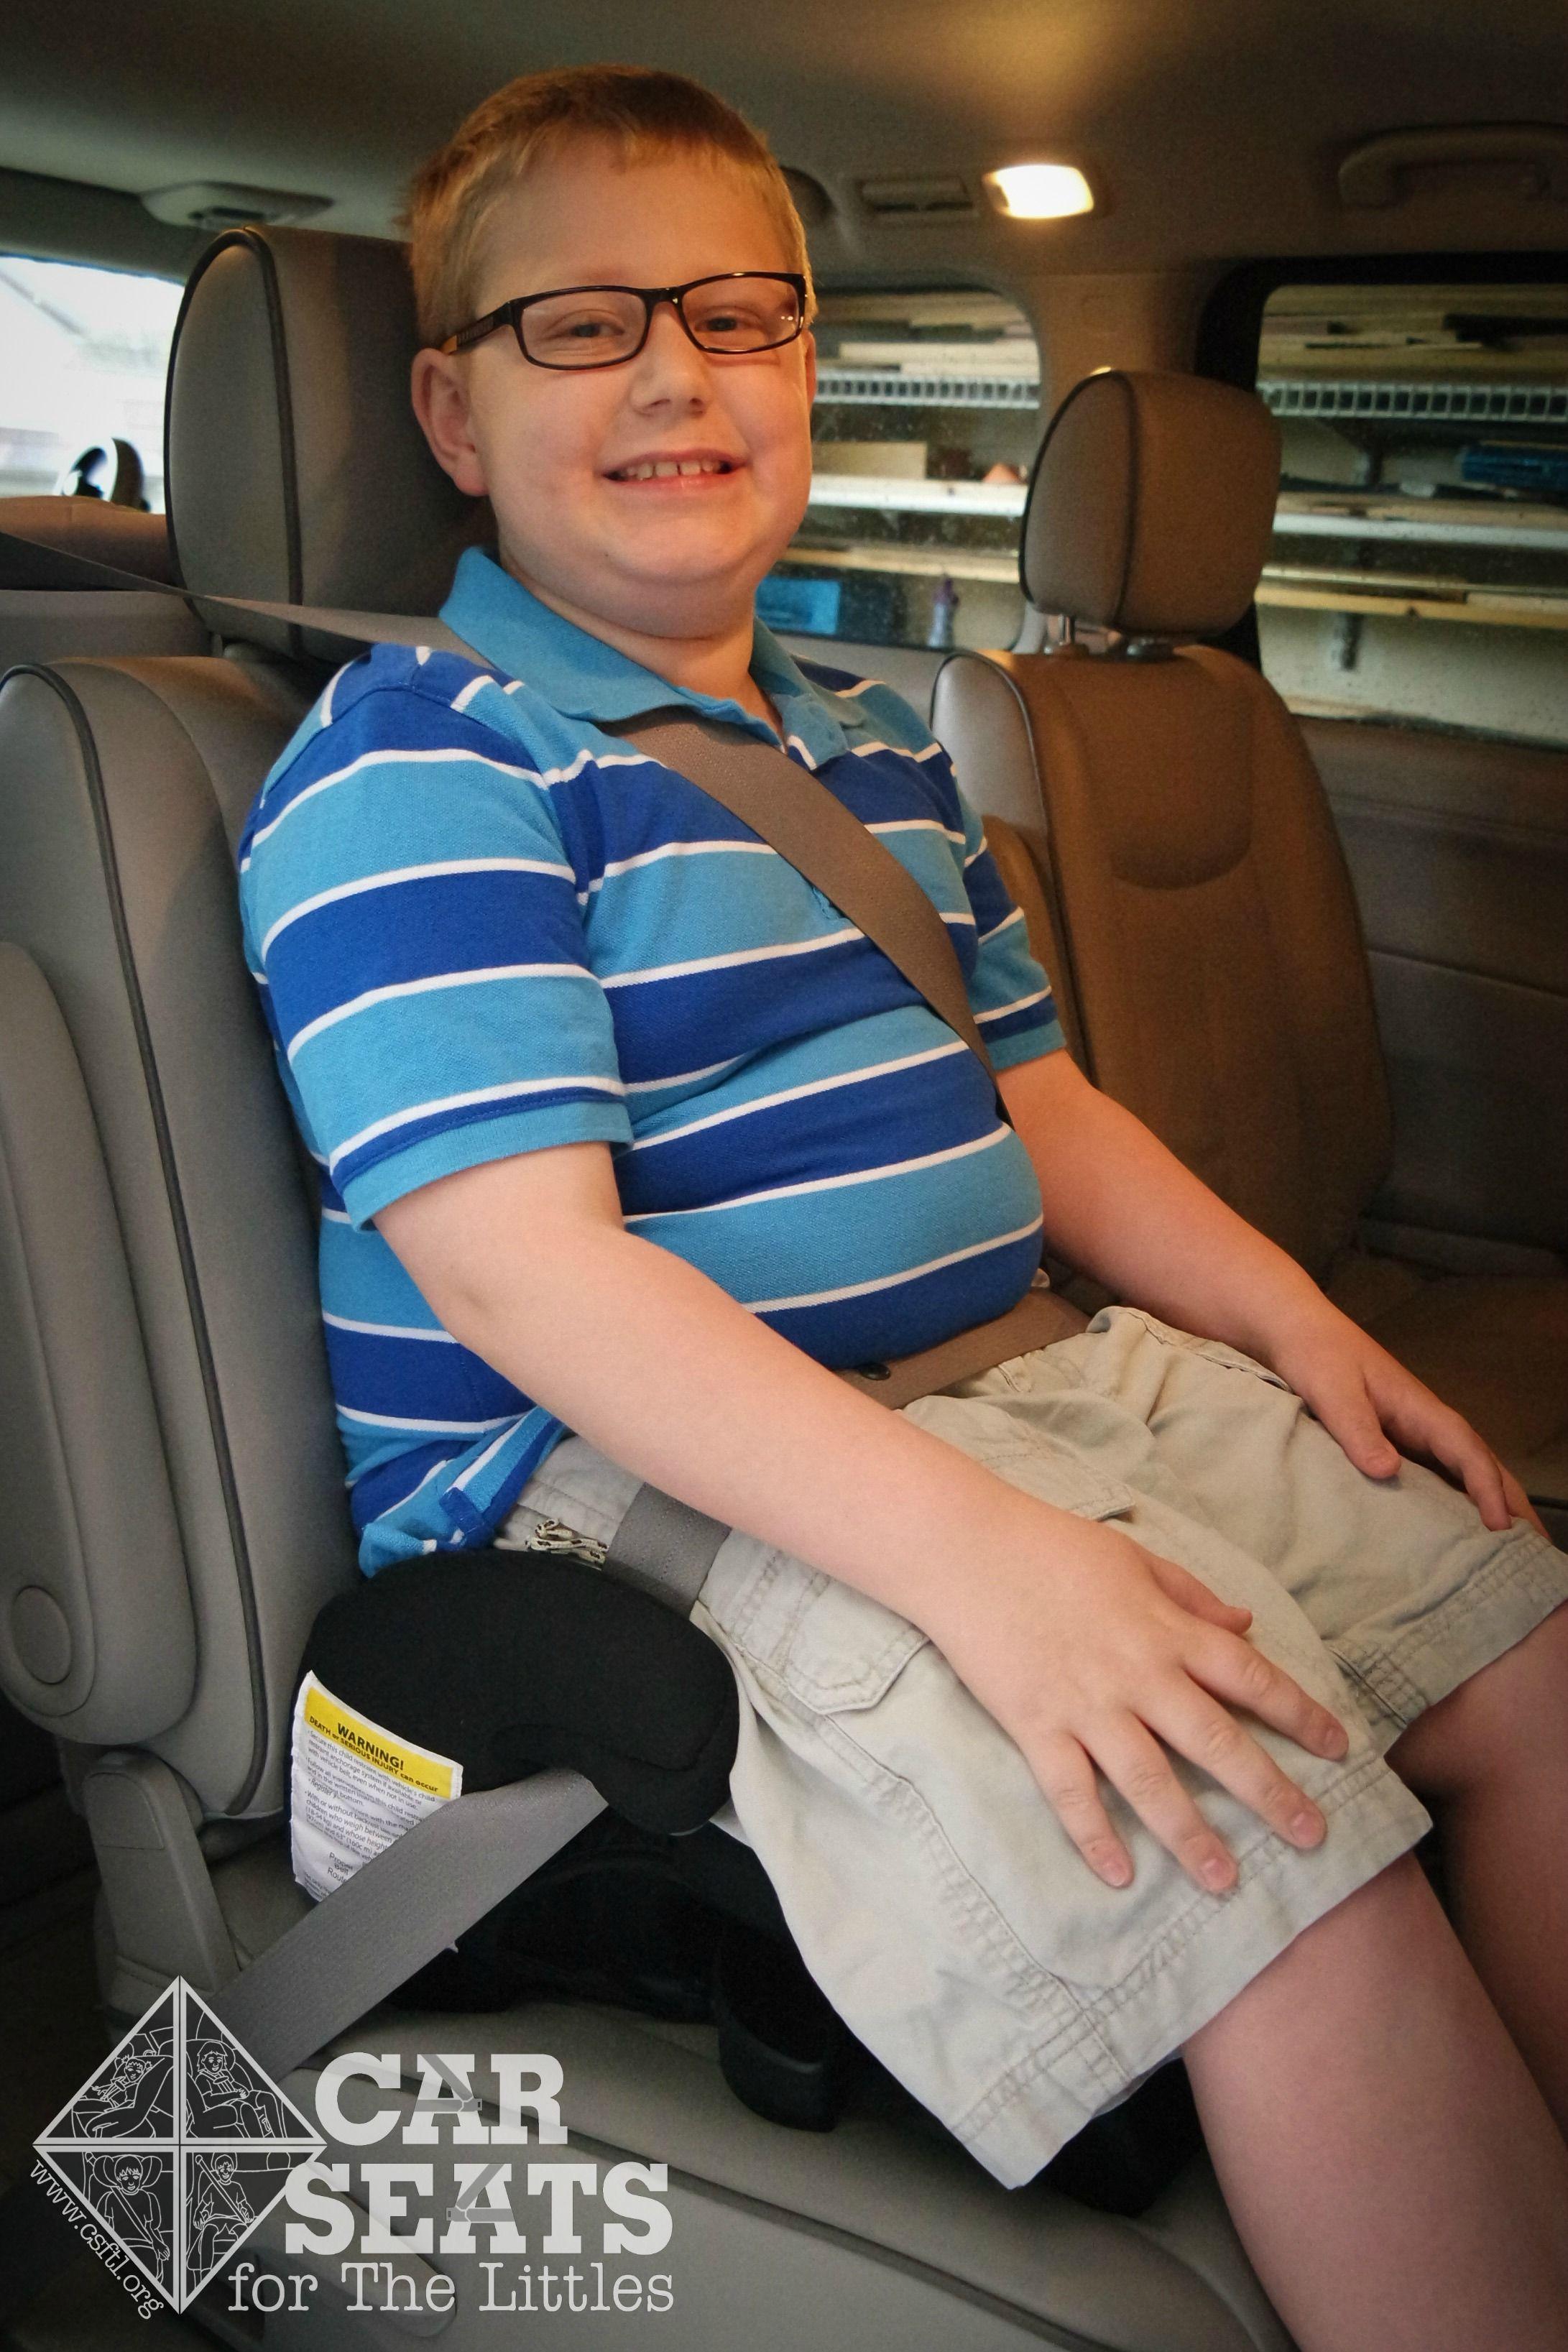 Diono Solana: 9 Year Old, 115 lbs, 52